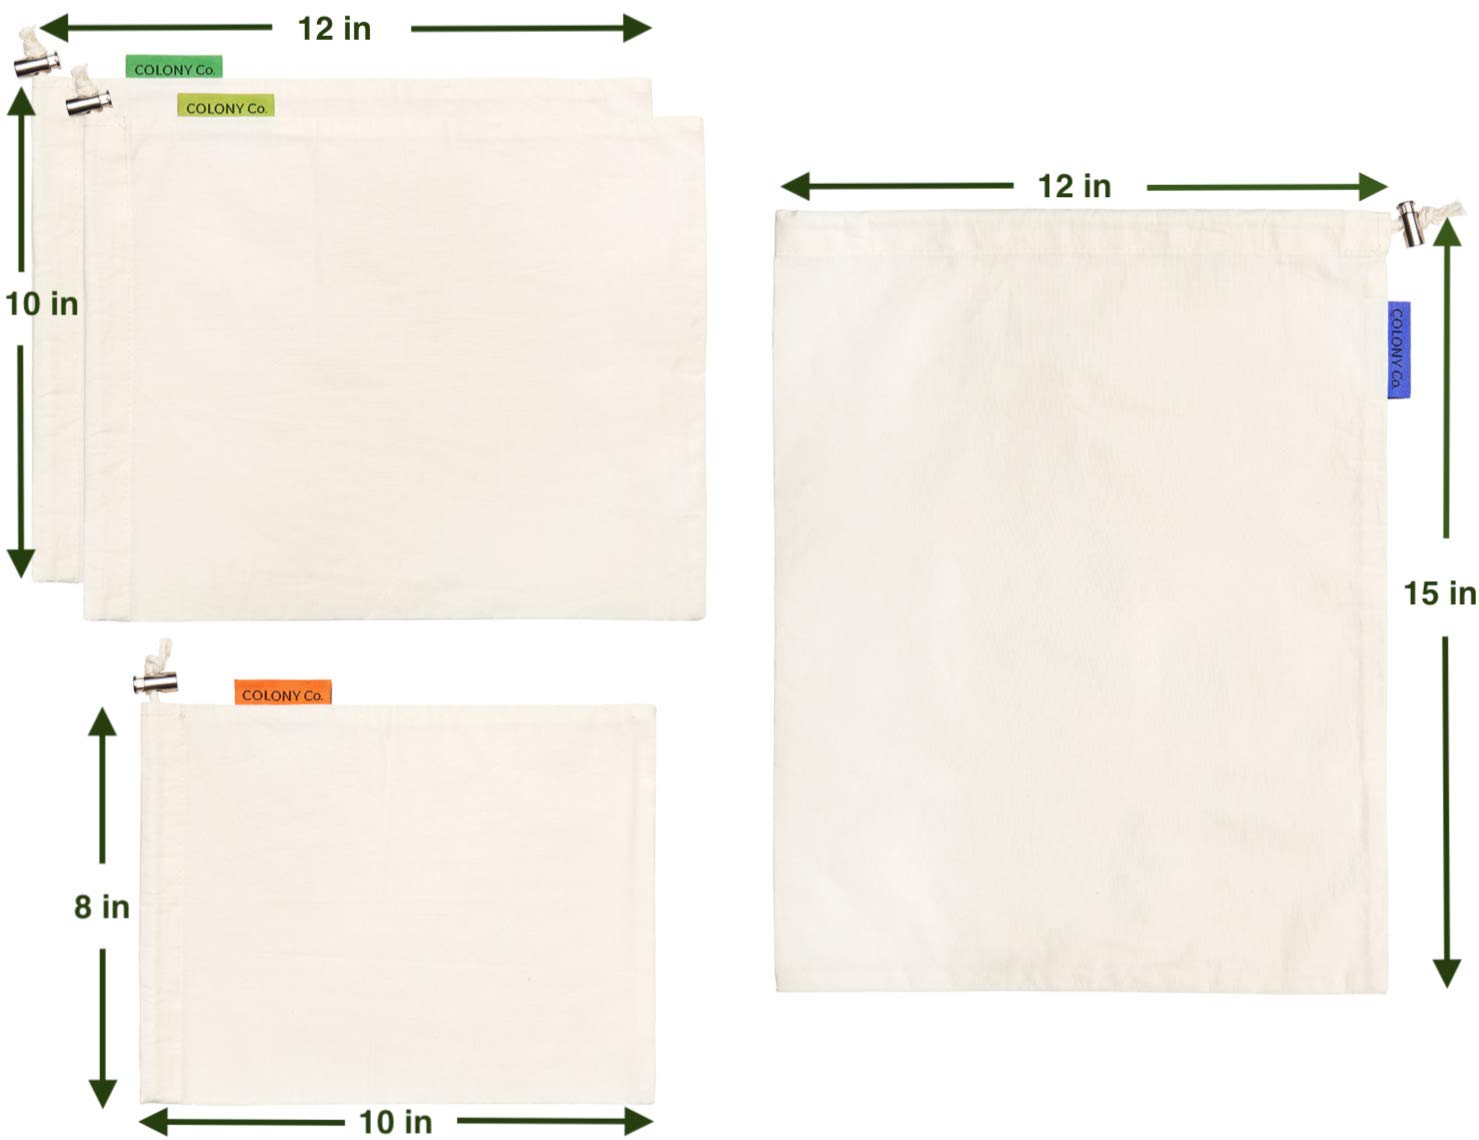 COLONY CO Bolsas de productos reutilizables (Materiales de algodón son biodegradables, lavables a máquina, envases reciclables, peso de tara en la etiqueta) ...